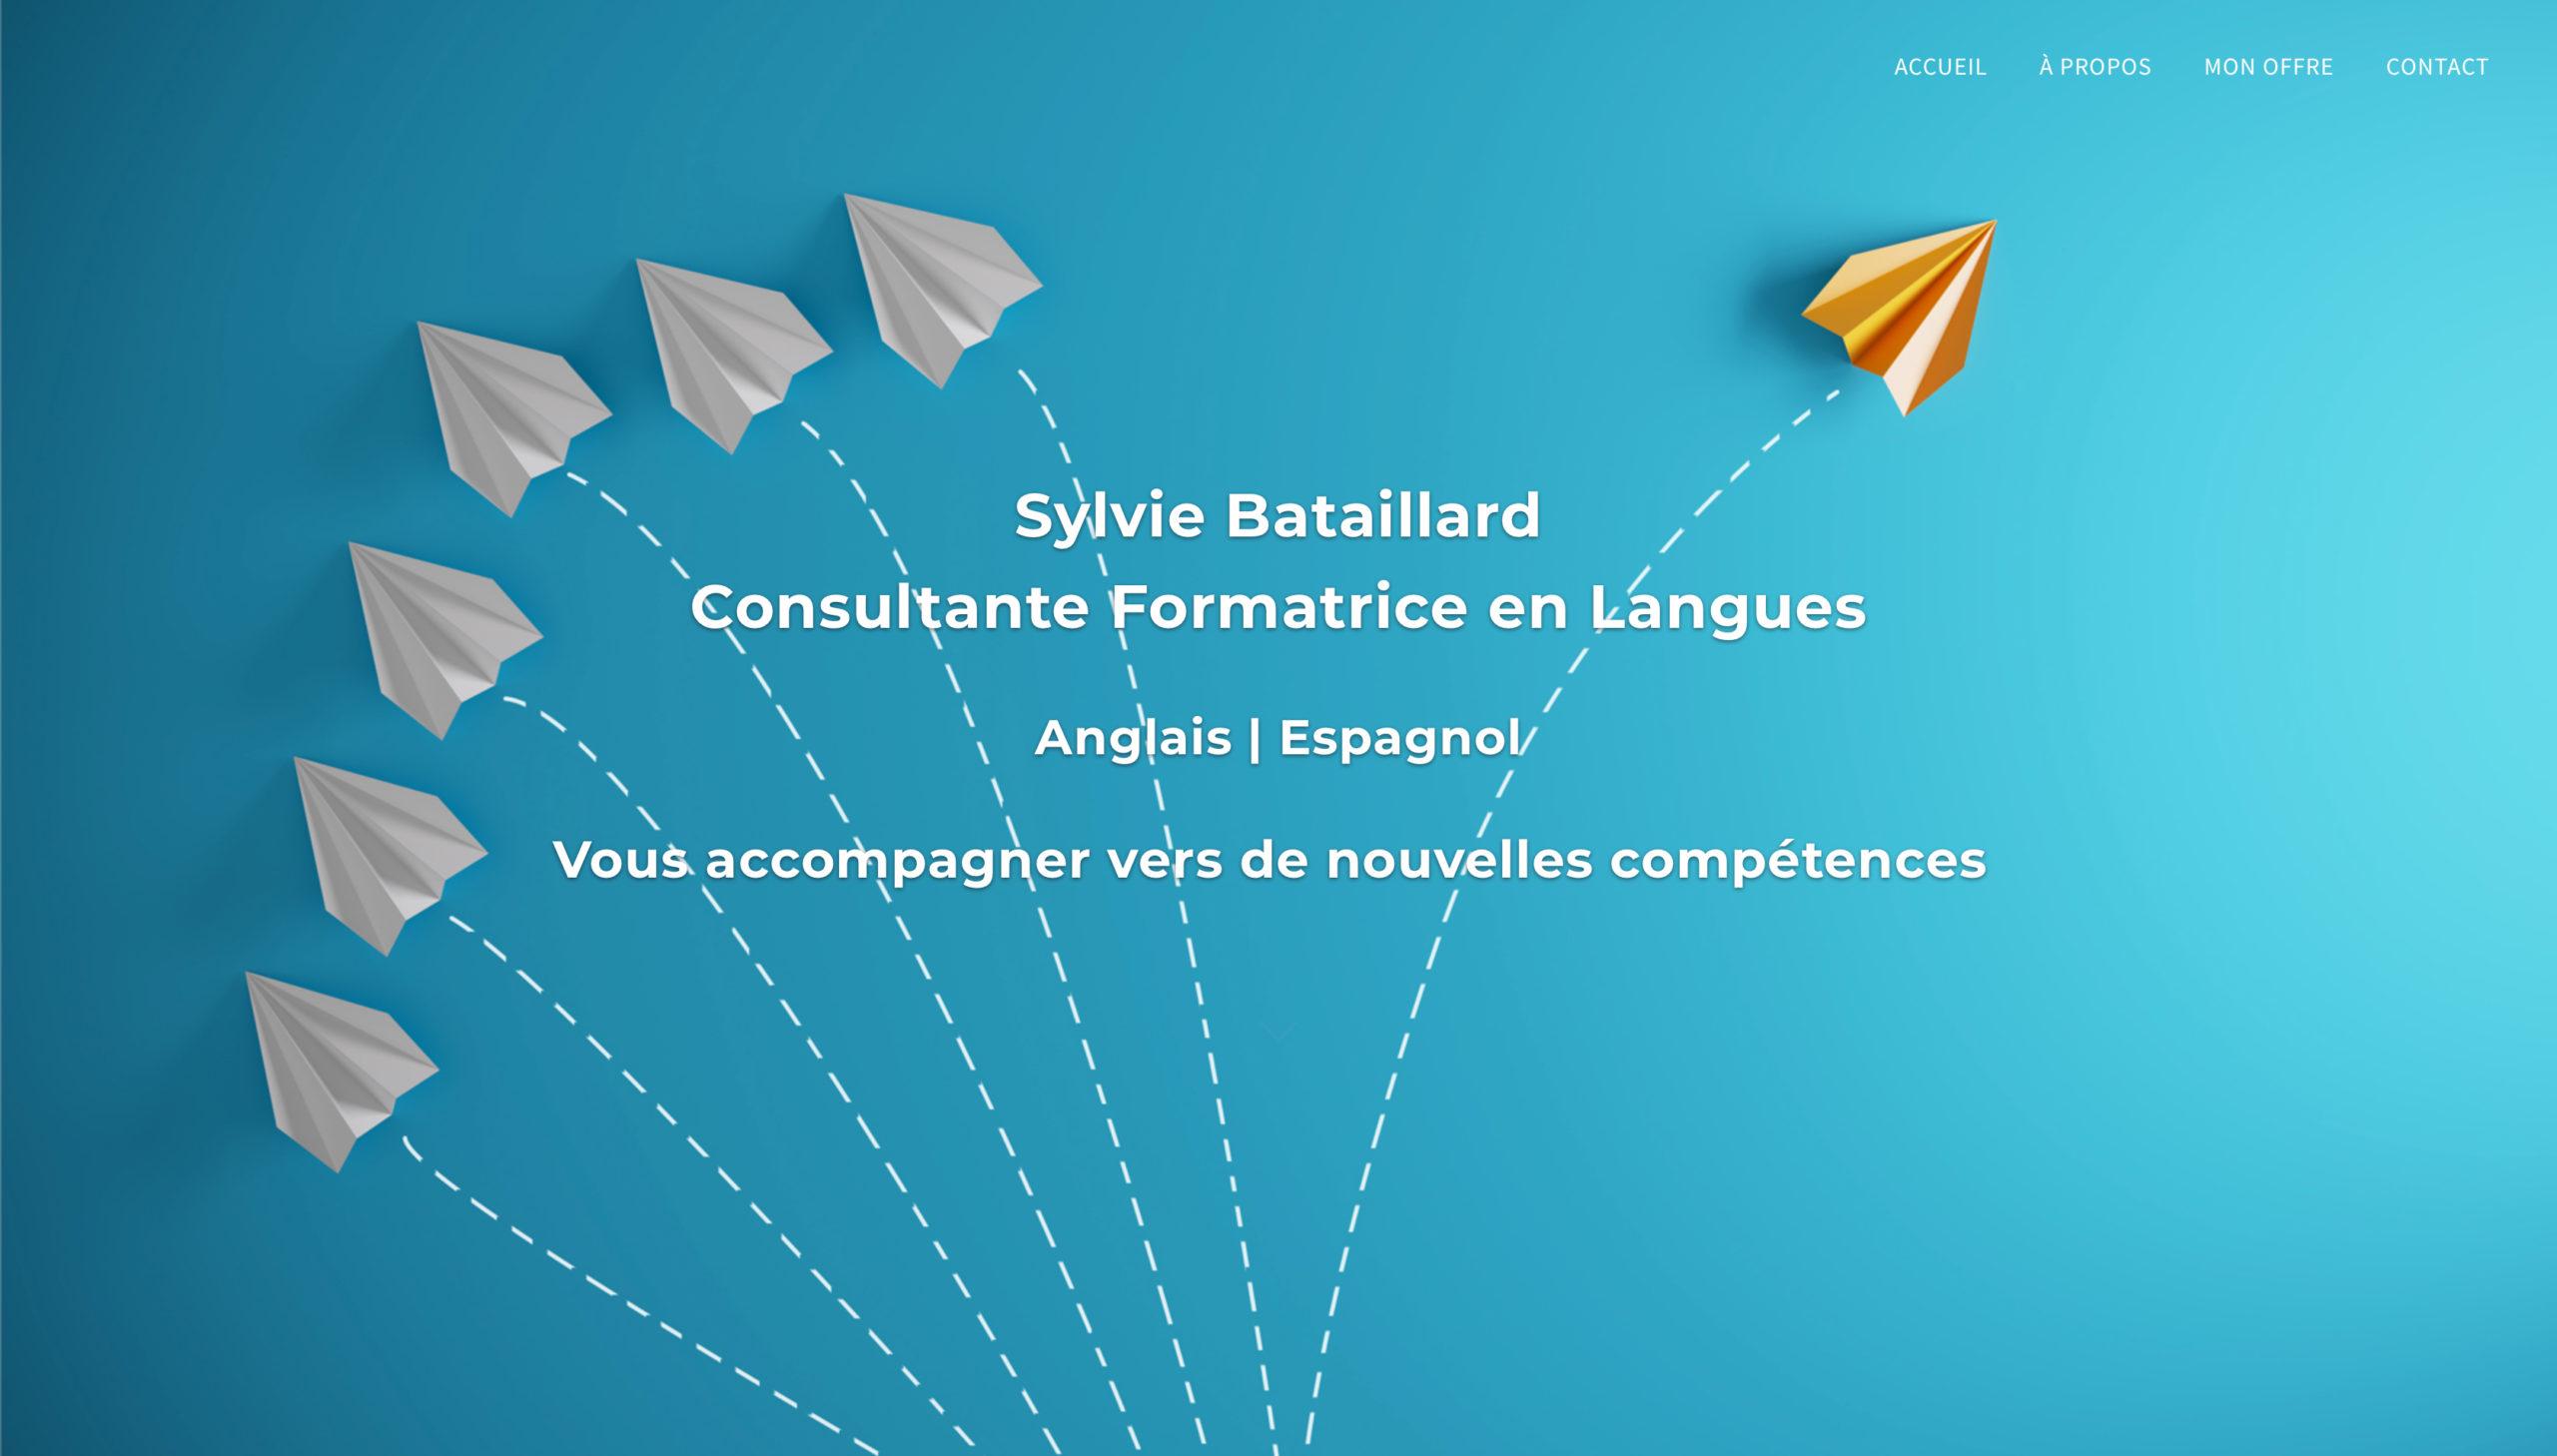 Sylvie Bataillard | Consultante formatrice en langues - 2020 - Webdesign - Matthieu Loigerot